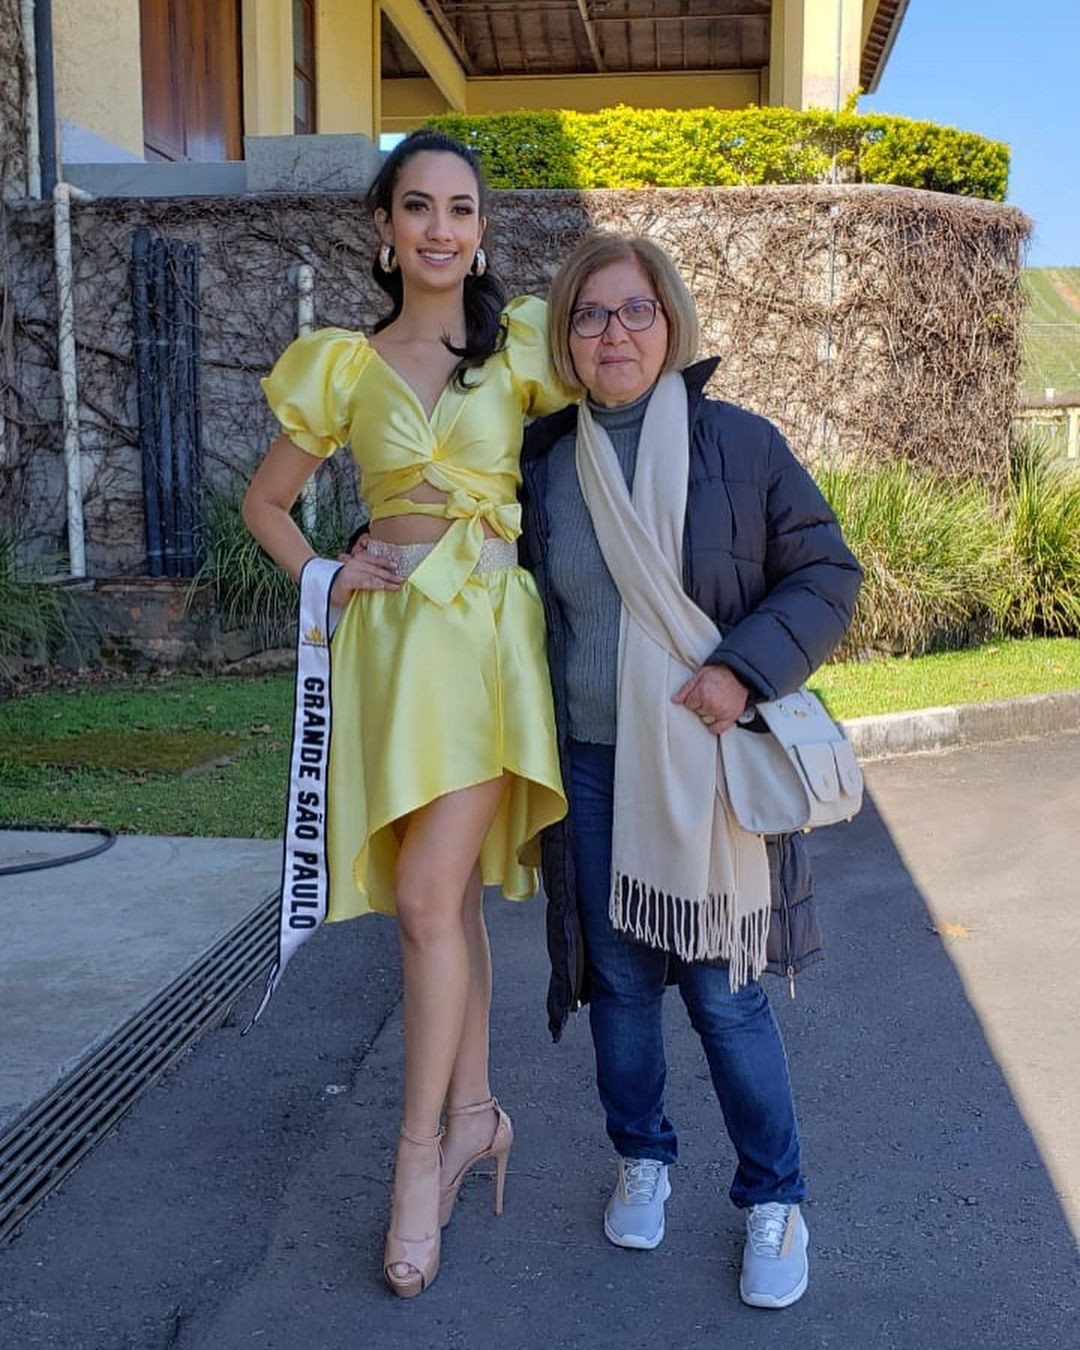 sandy menezes, miss grande sao paulo mundo 2019. - Página 4 Fmtzru10